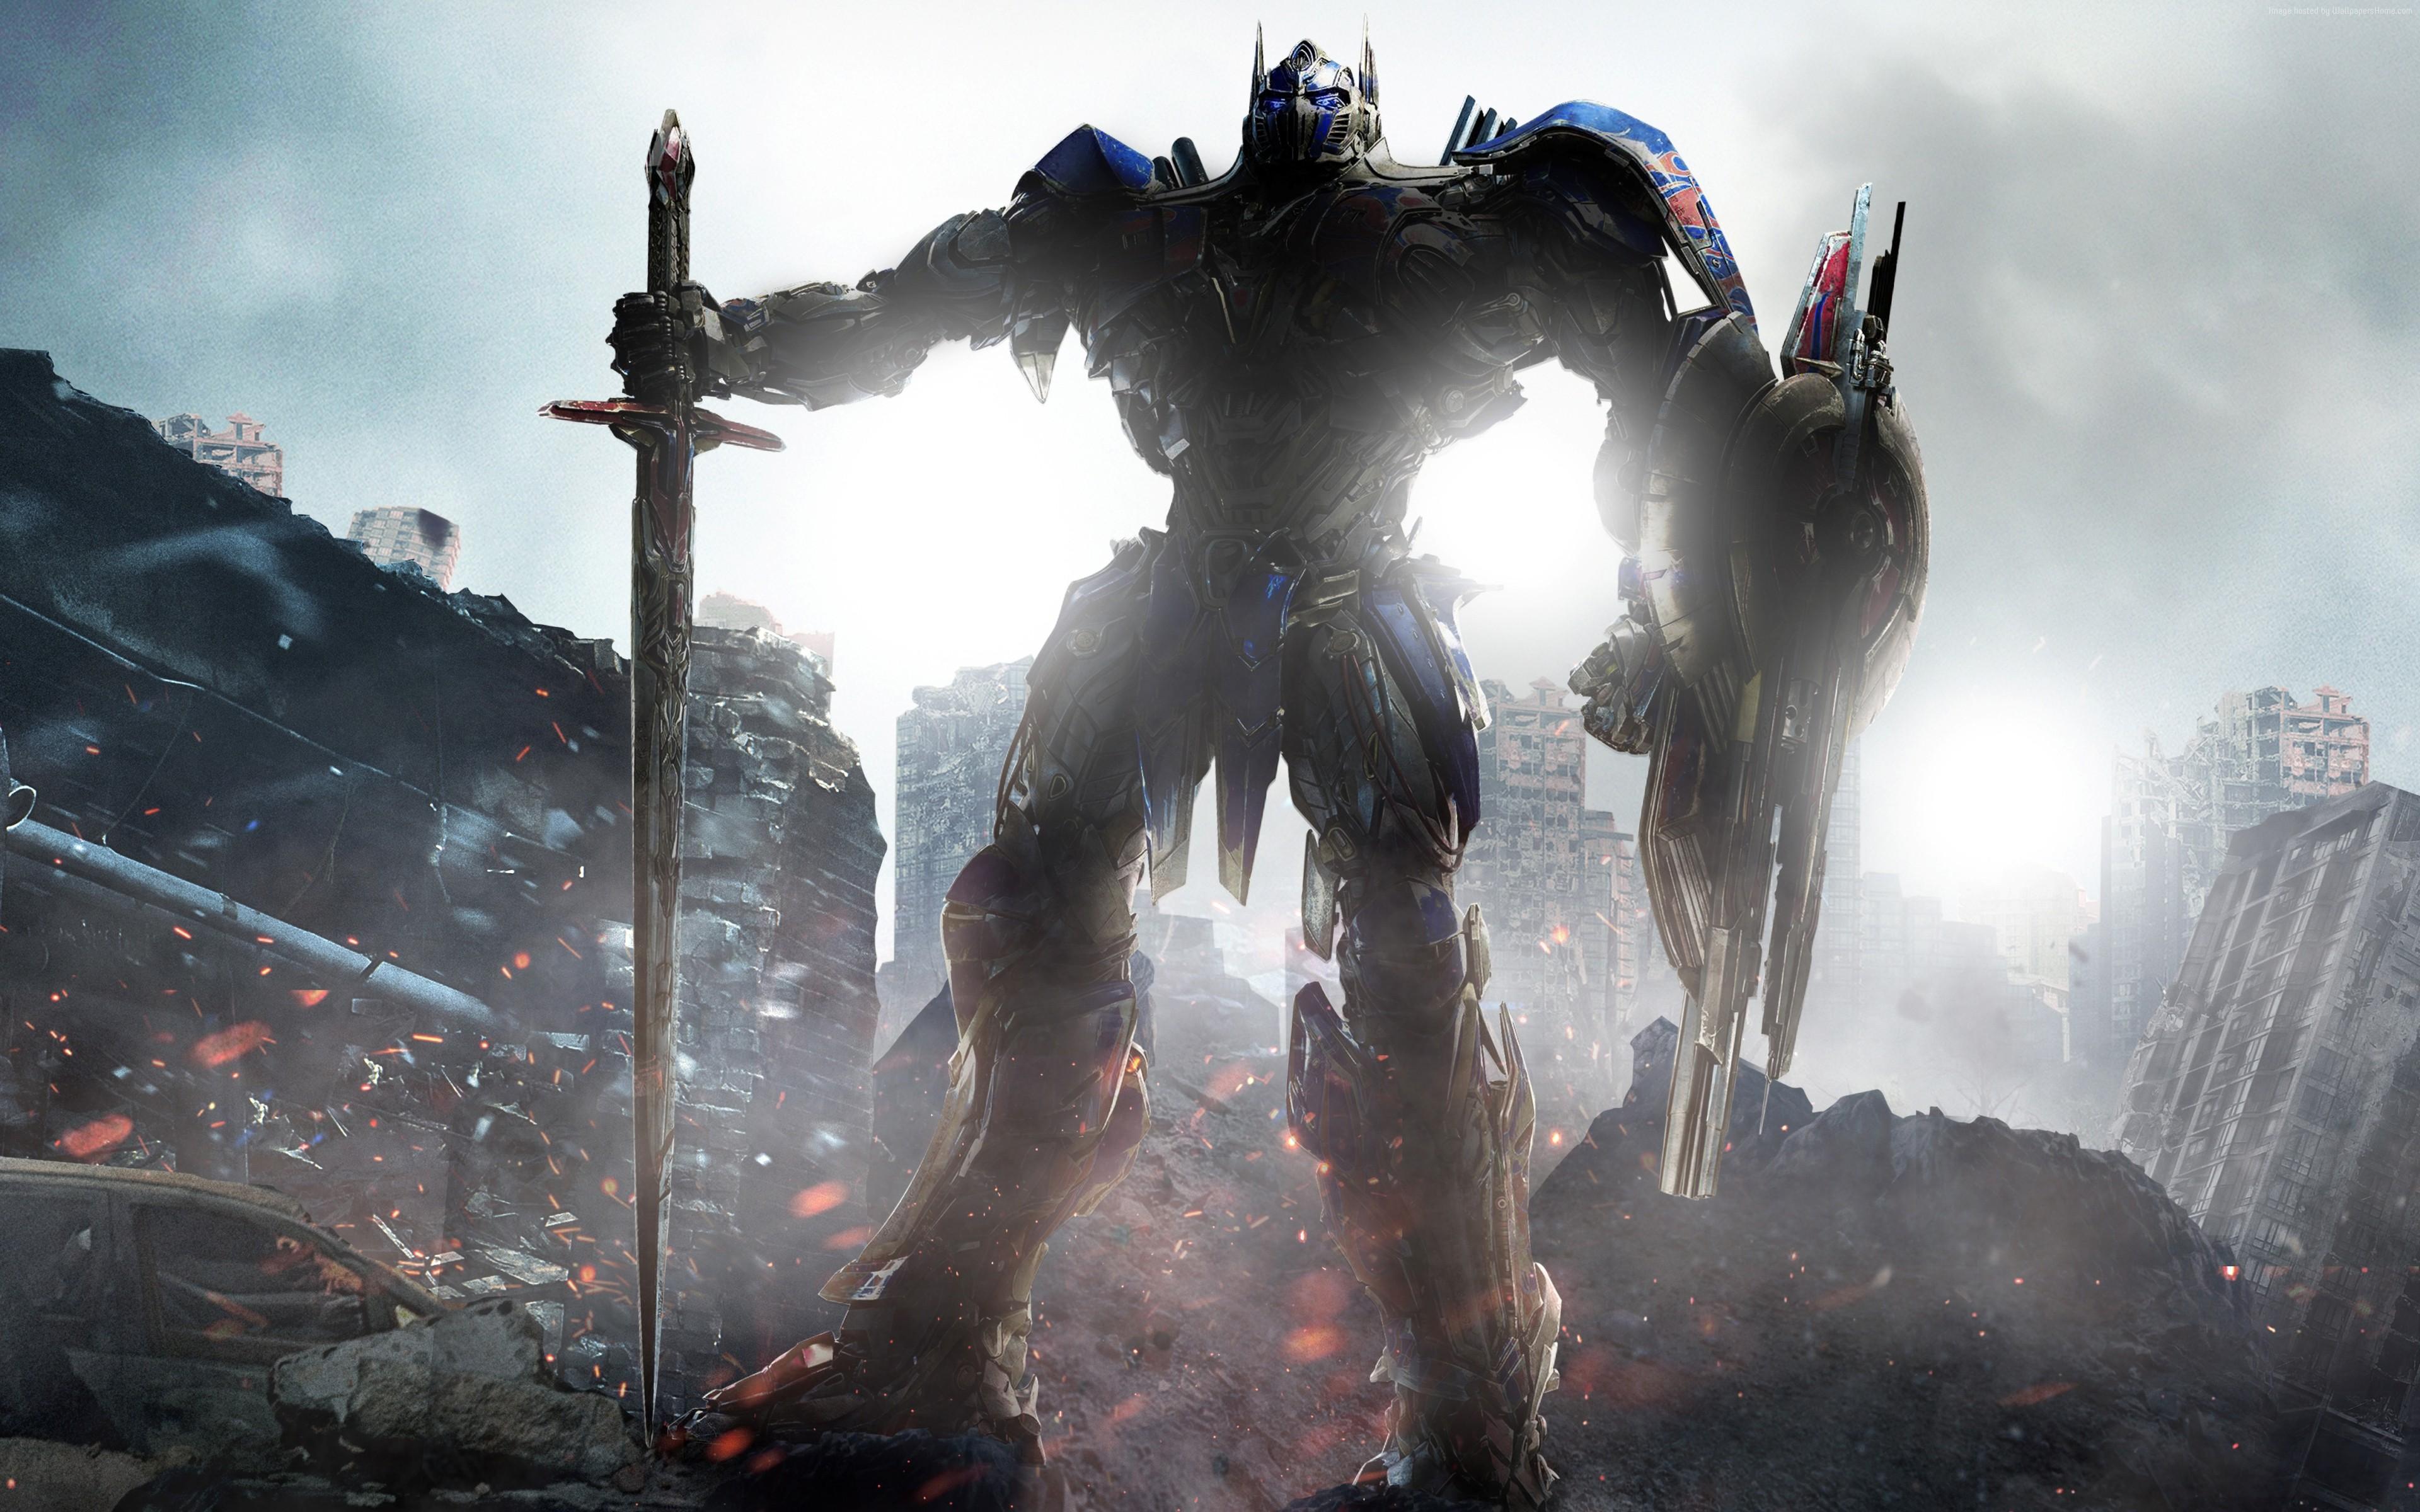 Optimus Prime Transformers The Last Knight 4k, HD Movies ...